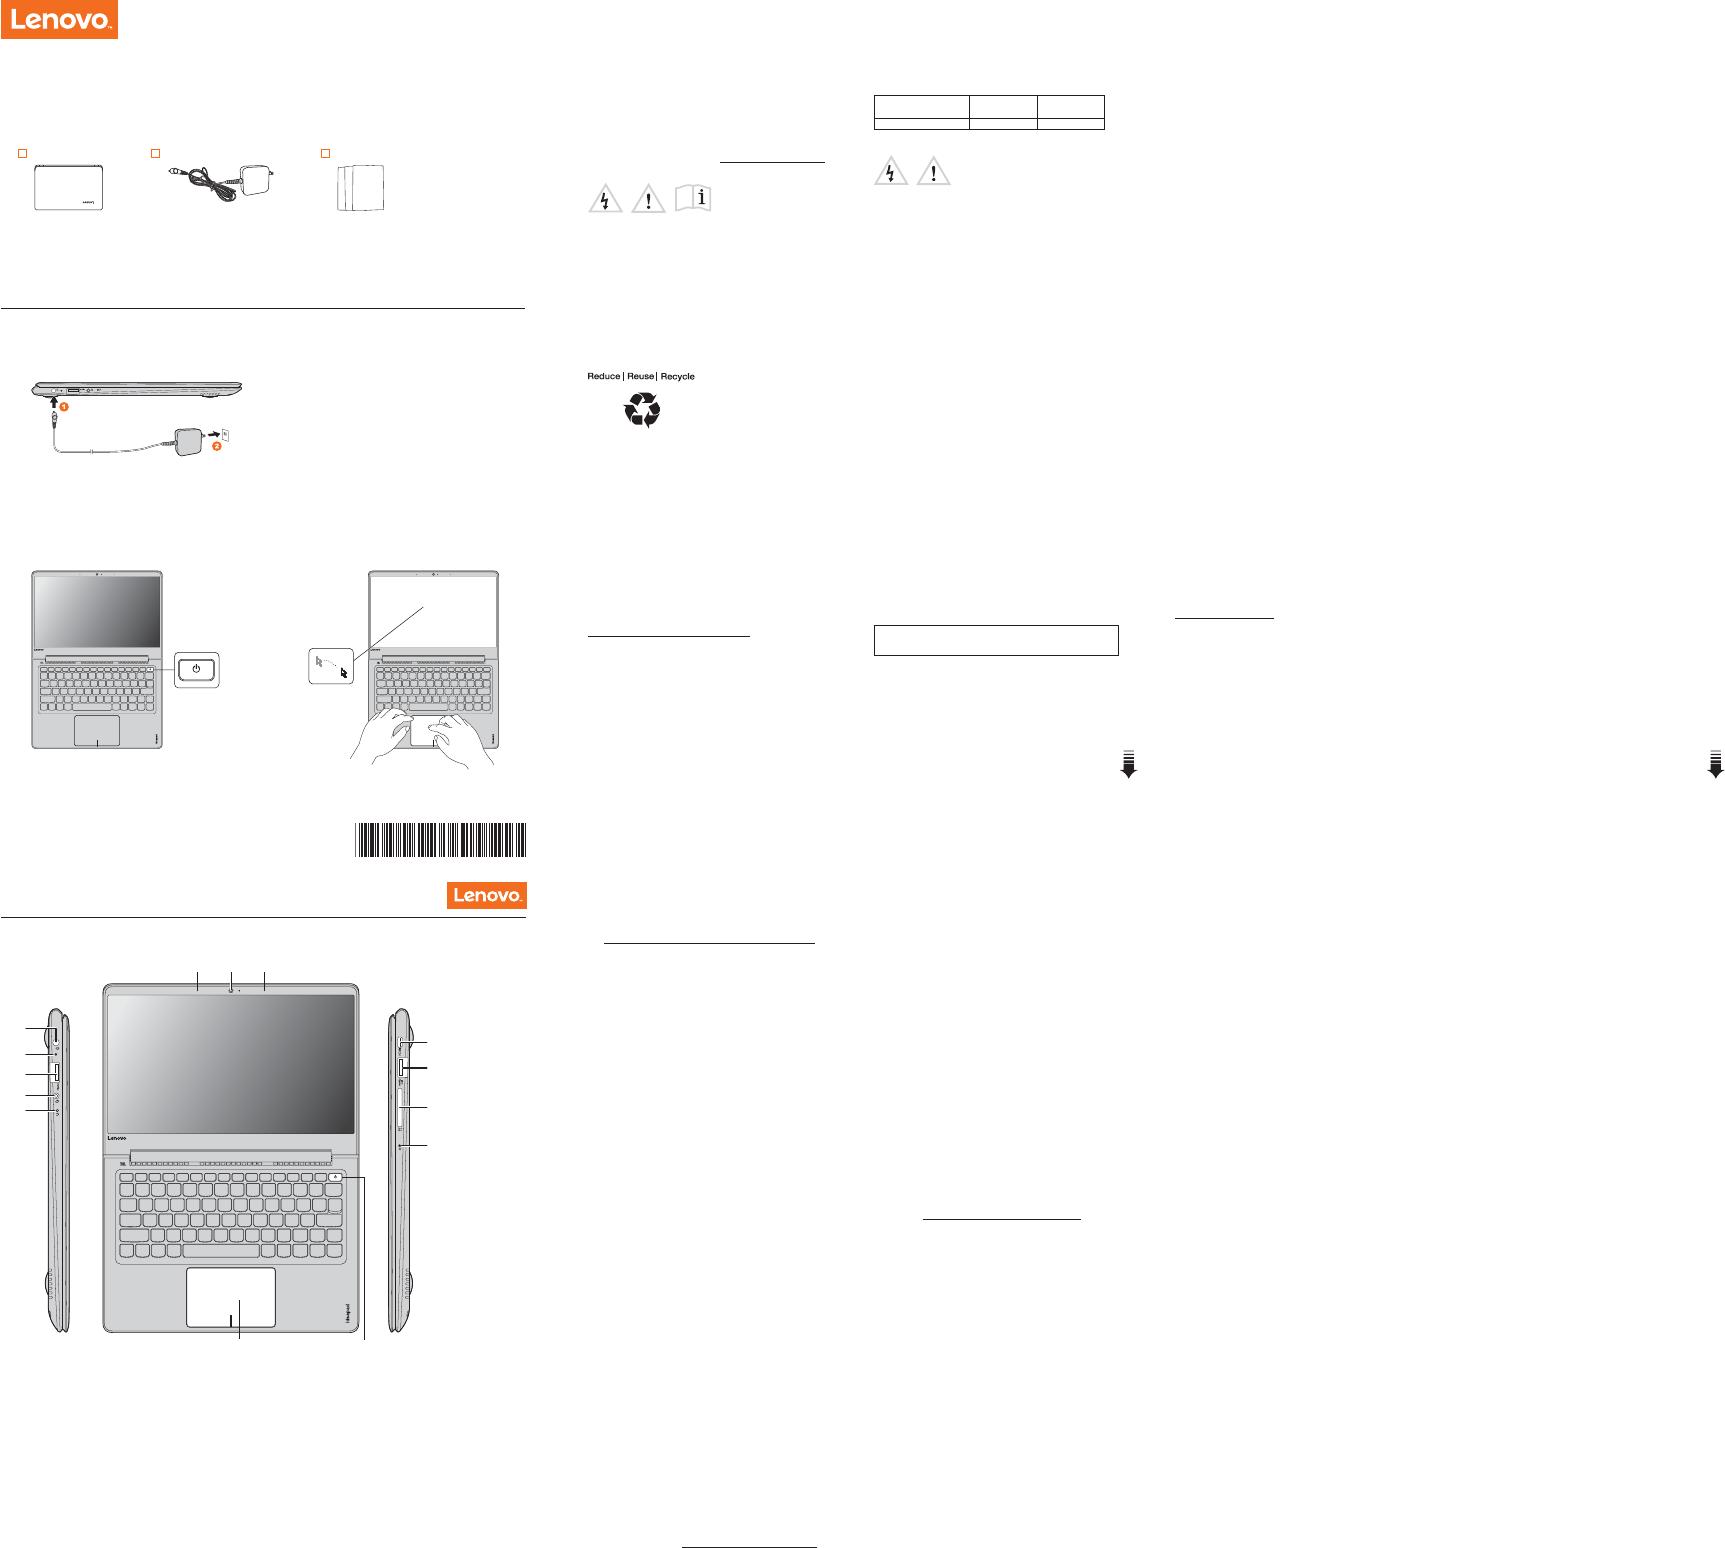 Lenovo Ideapad 710S 13Ikb Swsg Es 201608 User Manual